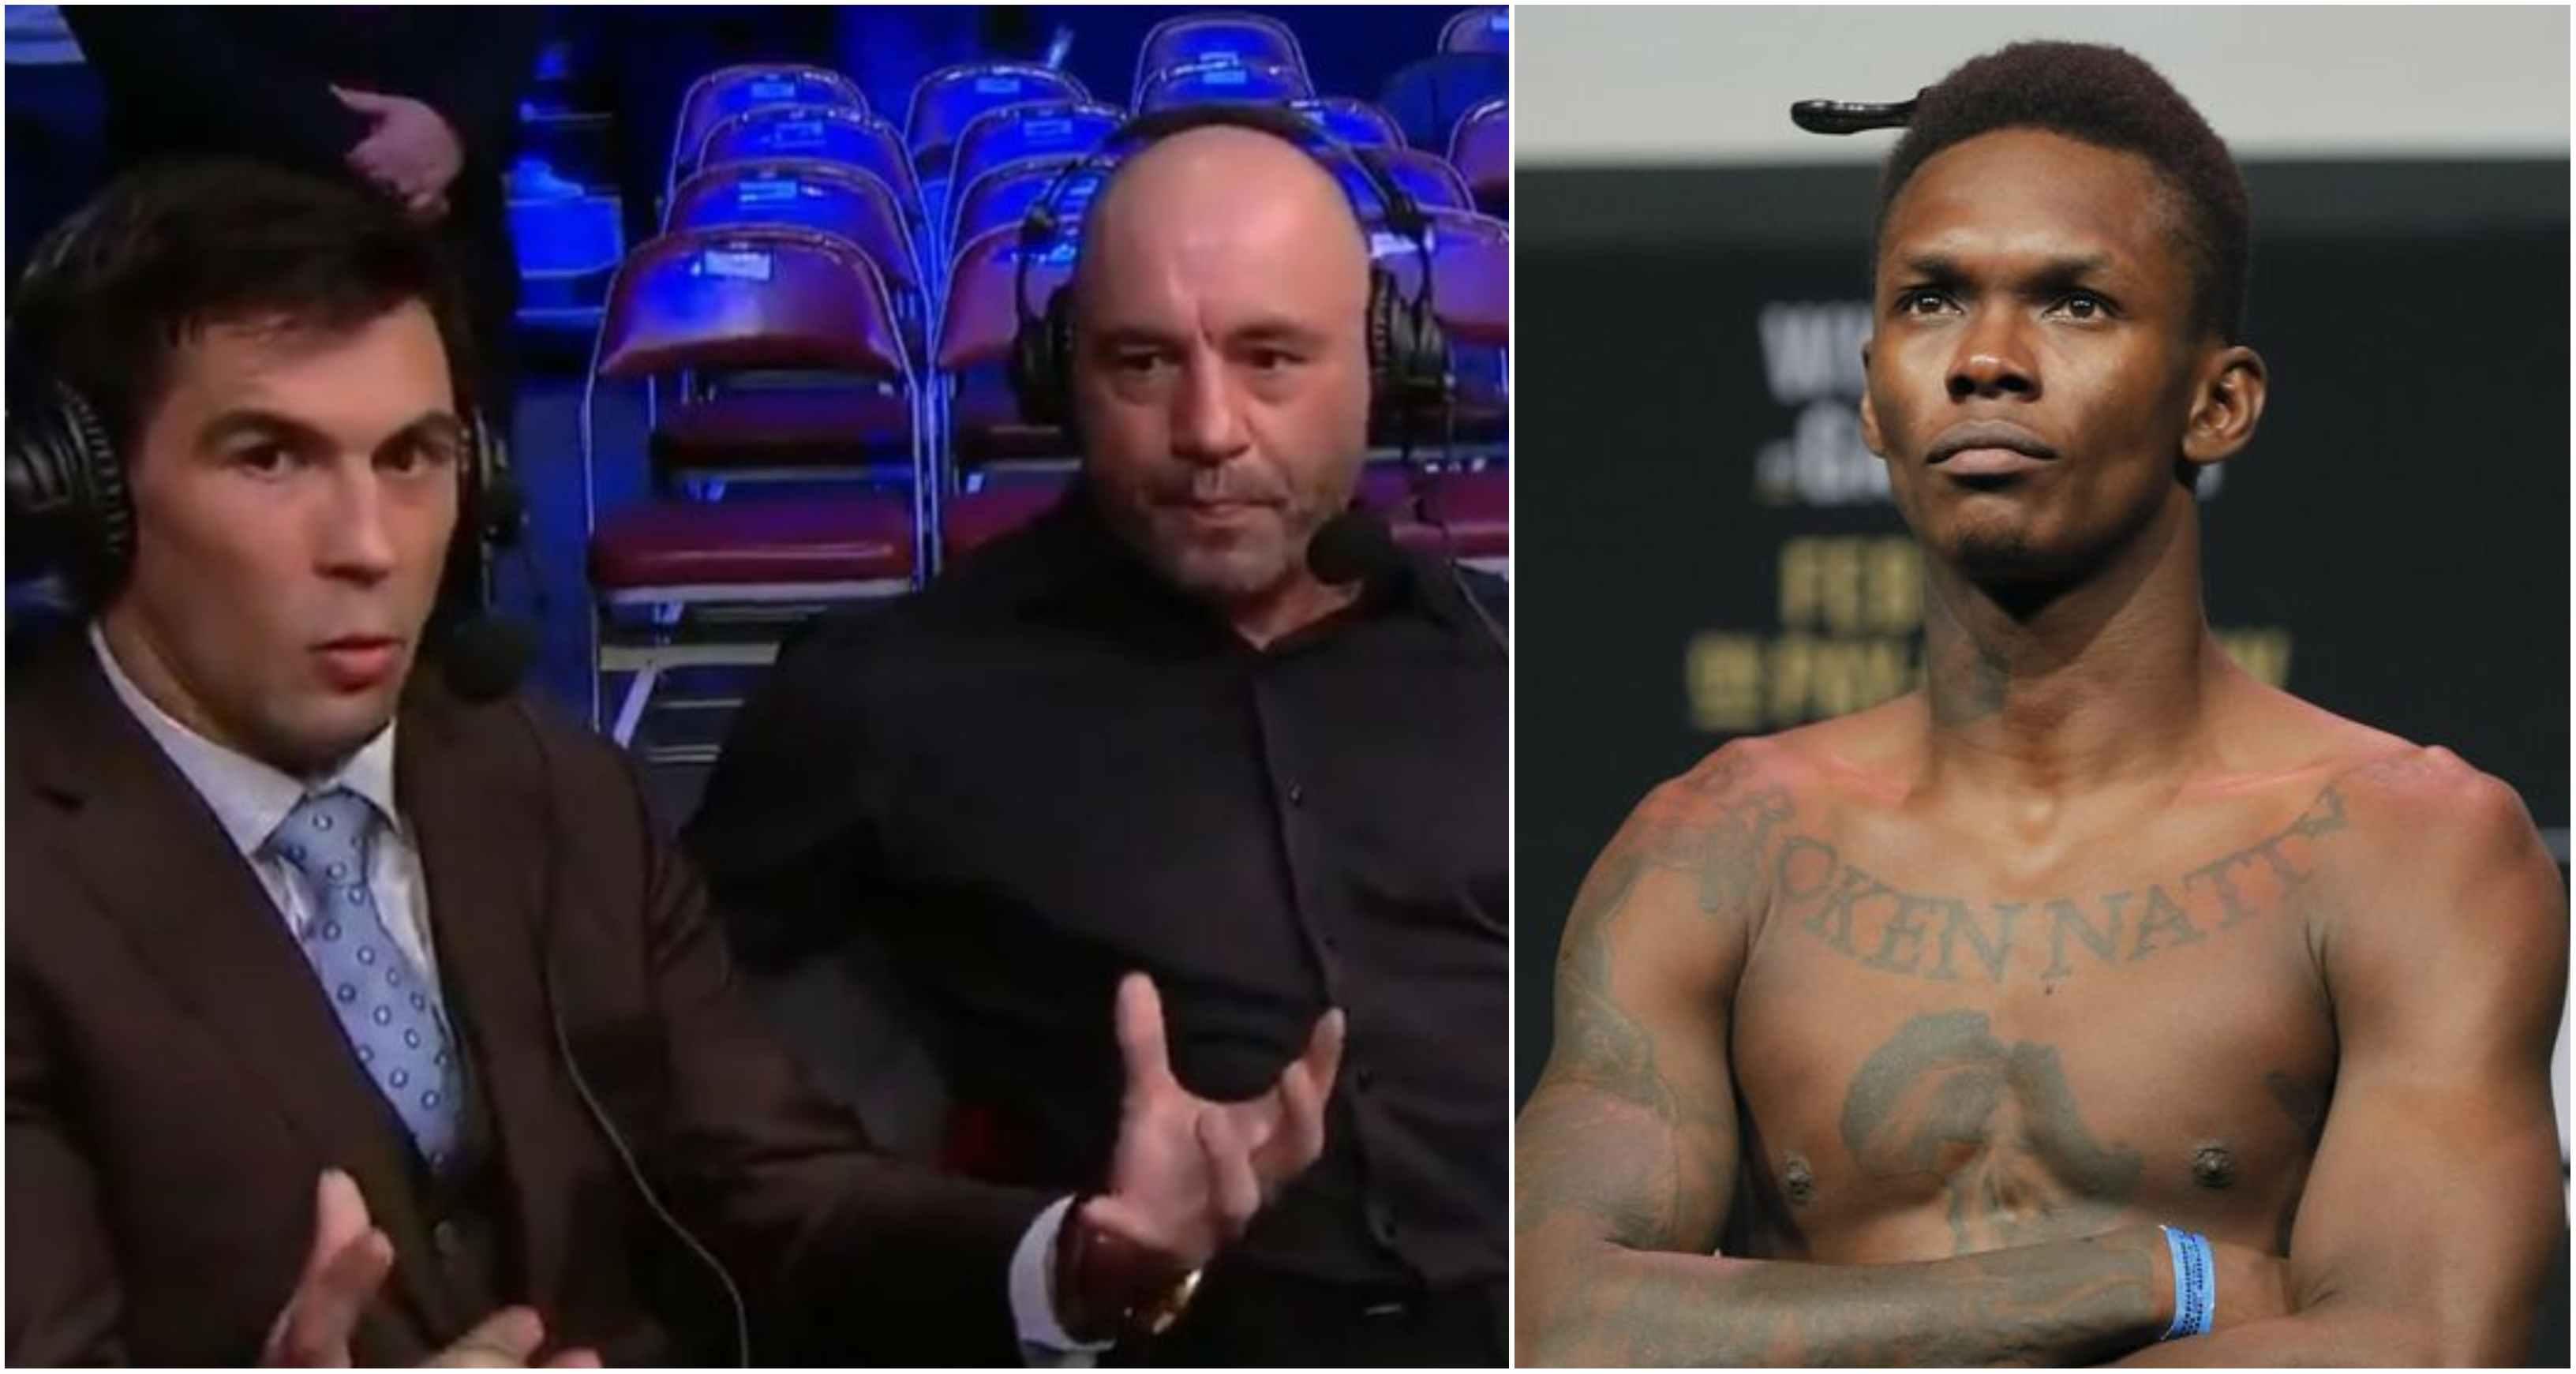 UFC News: Israel Adesanya agrees with Cruz, Rogan take on ineffective judging in the sport - Rogan